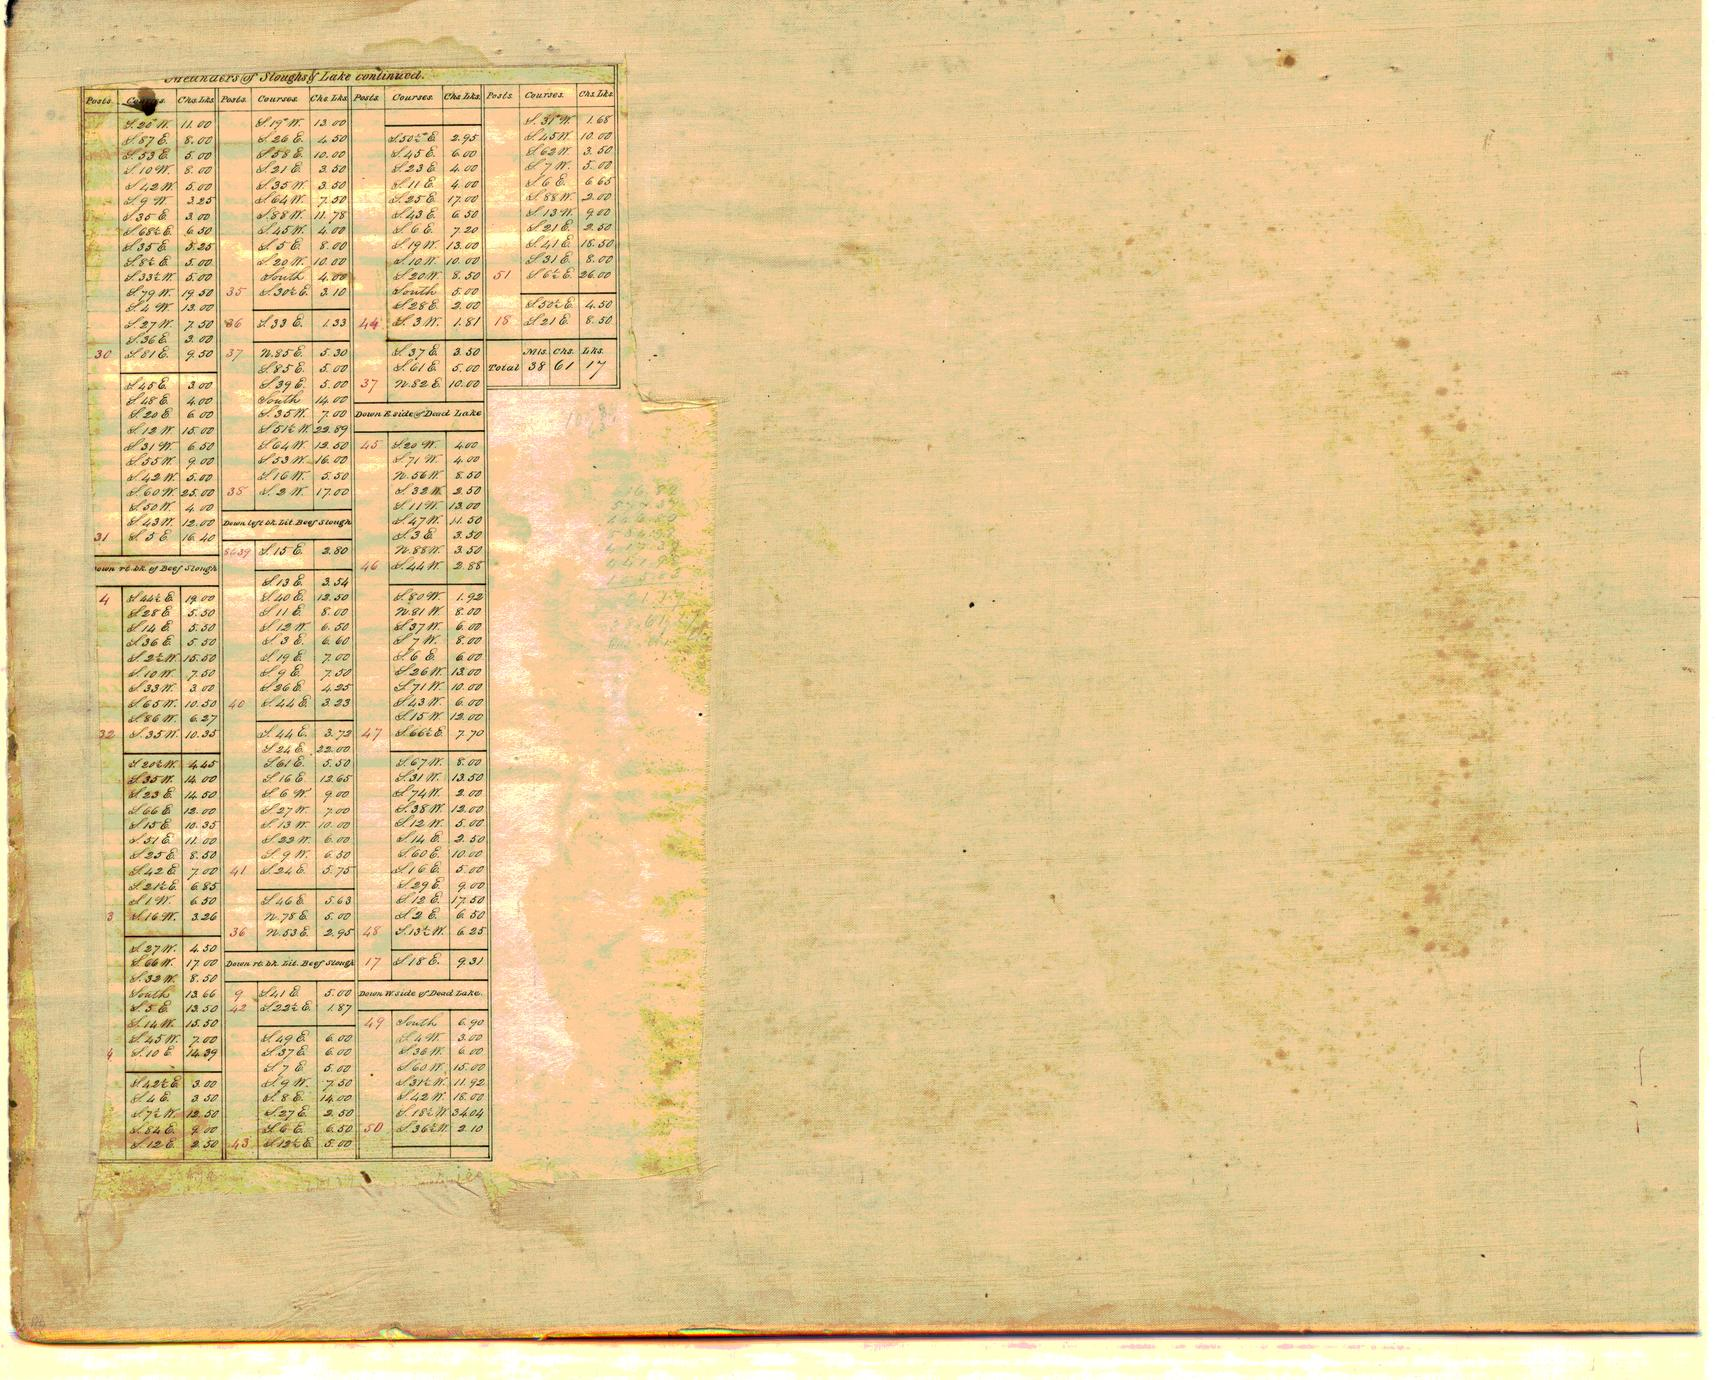 [Public Land Survey System map: Wisconsin Township 24 North, Range 14 West]